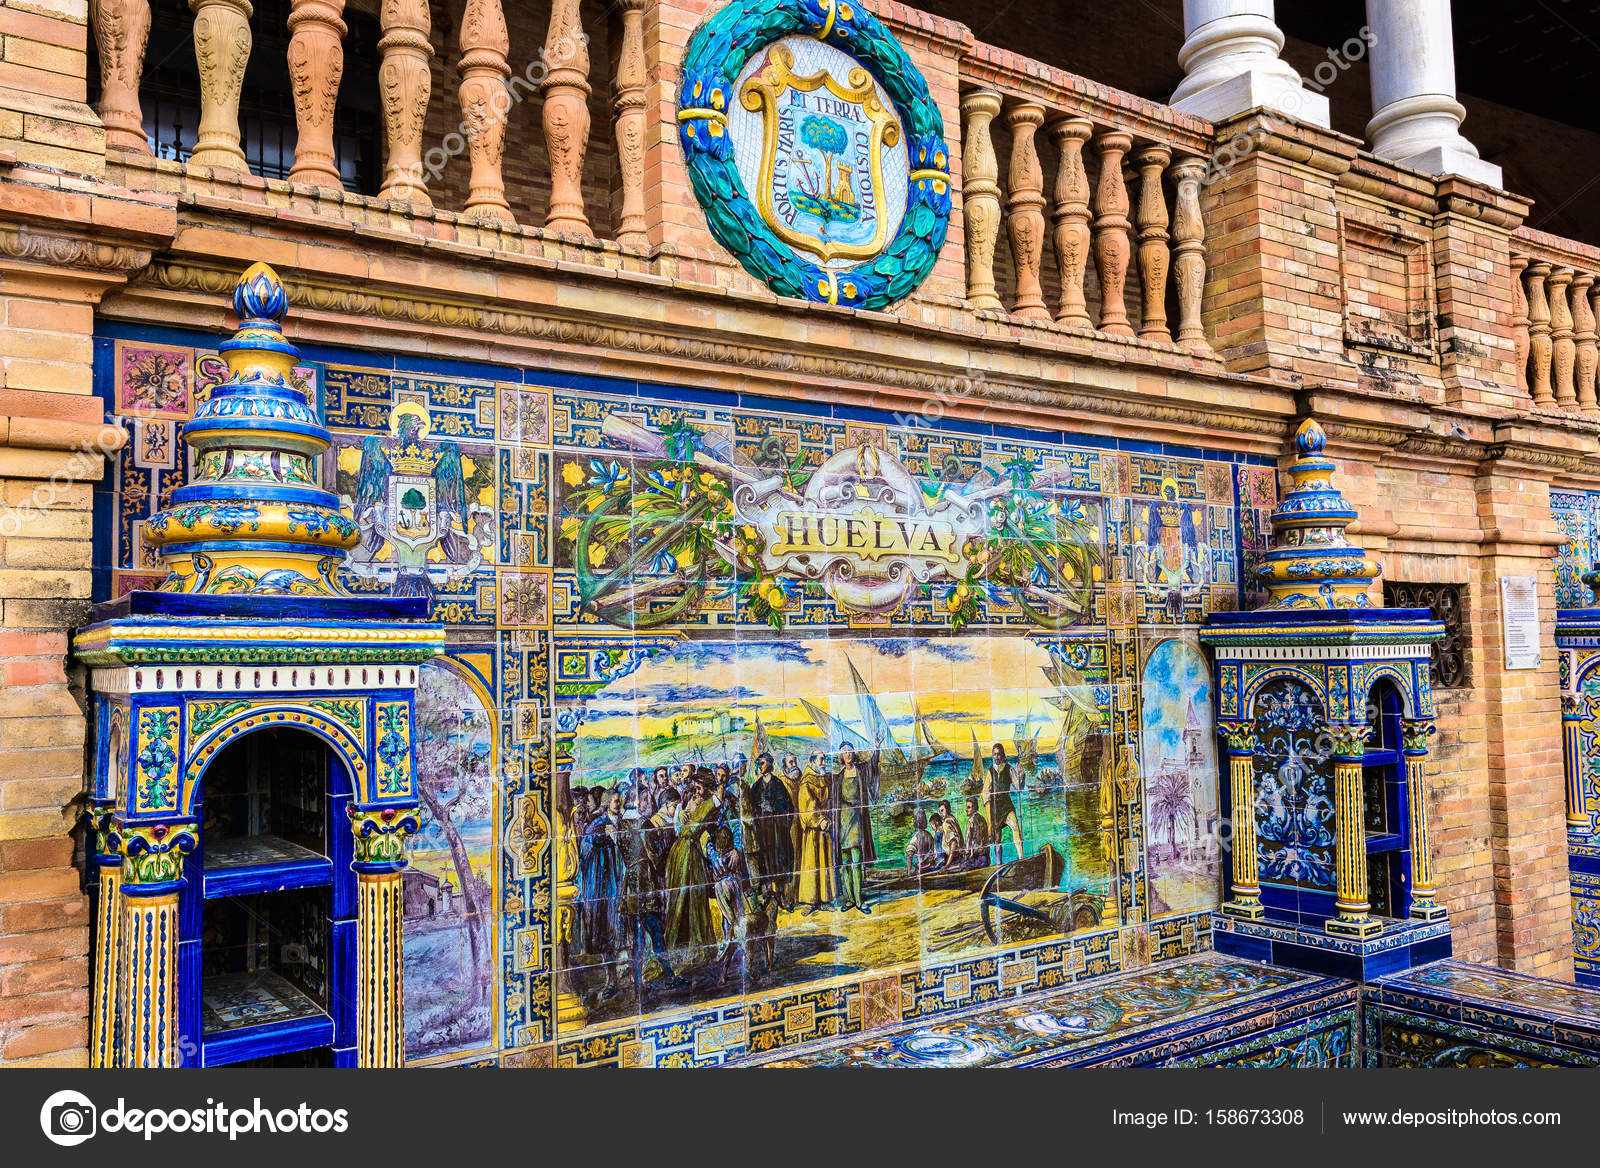 Terra Chat Huelva